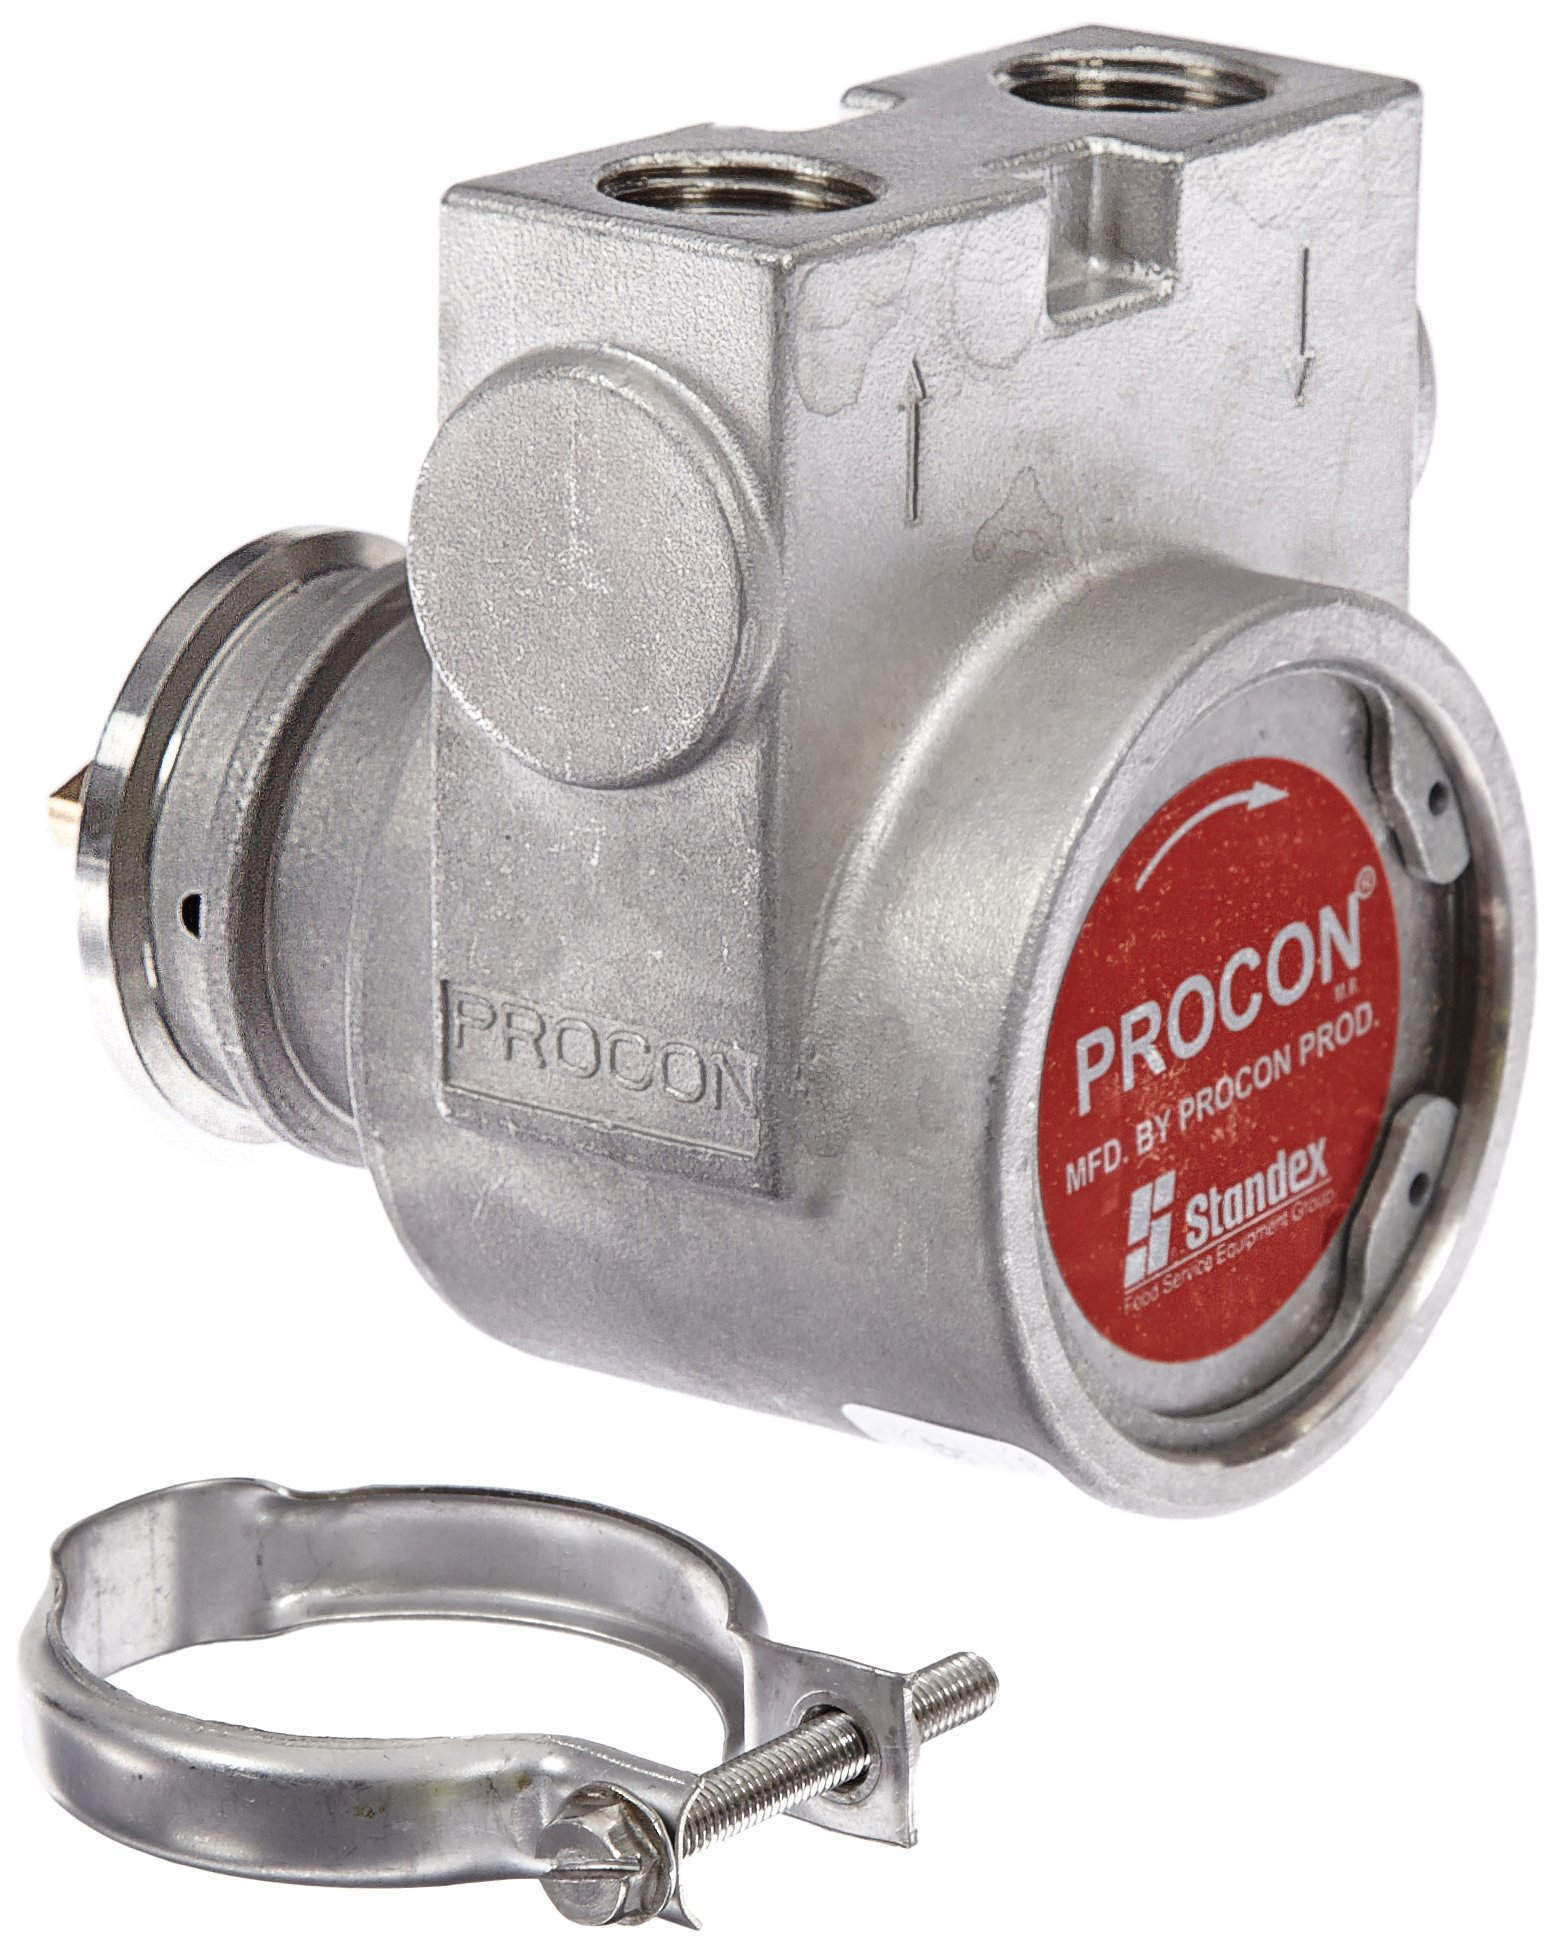 Procon 115B330F31XX Stainless Steel Rotary Vane Pump, 1/2'' NPTF, 346 GPH by Procon